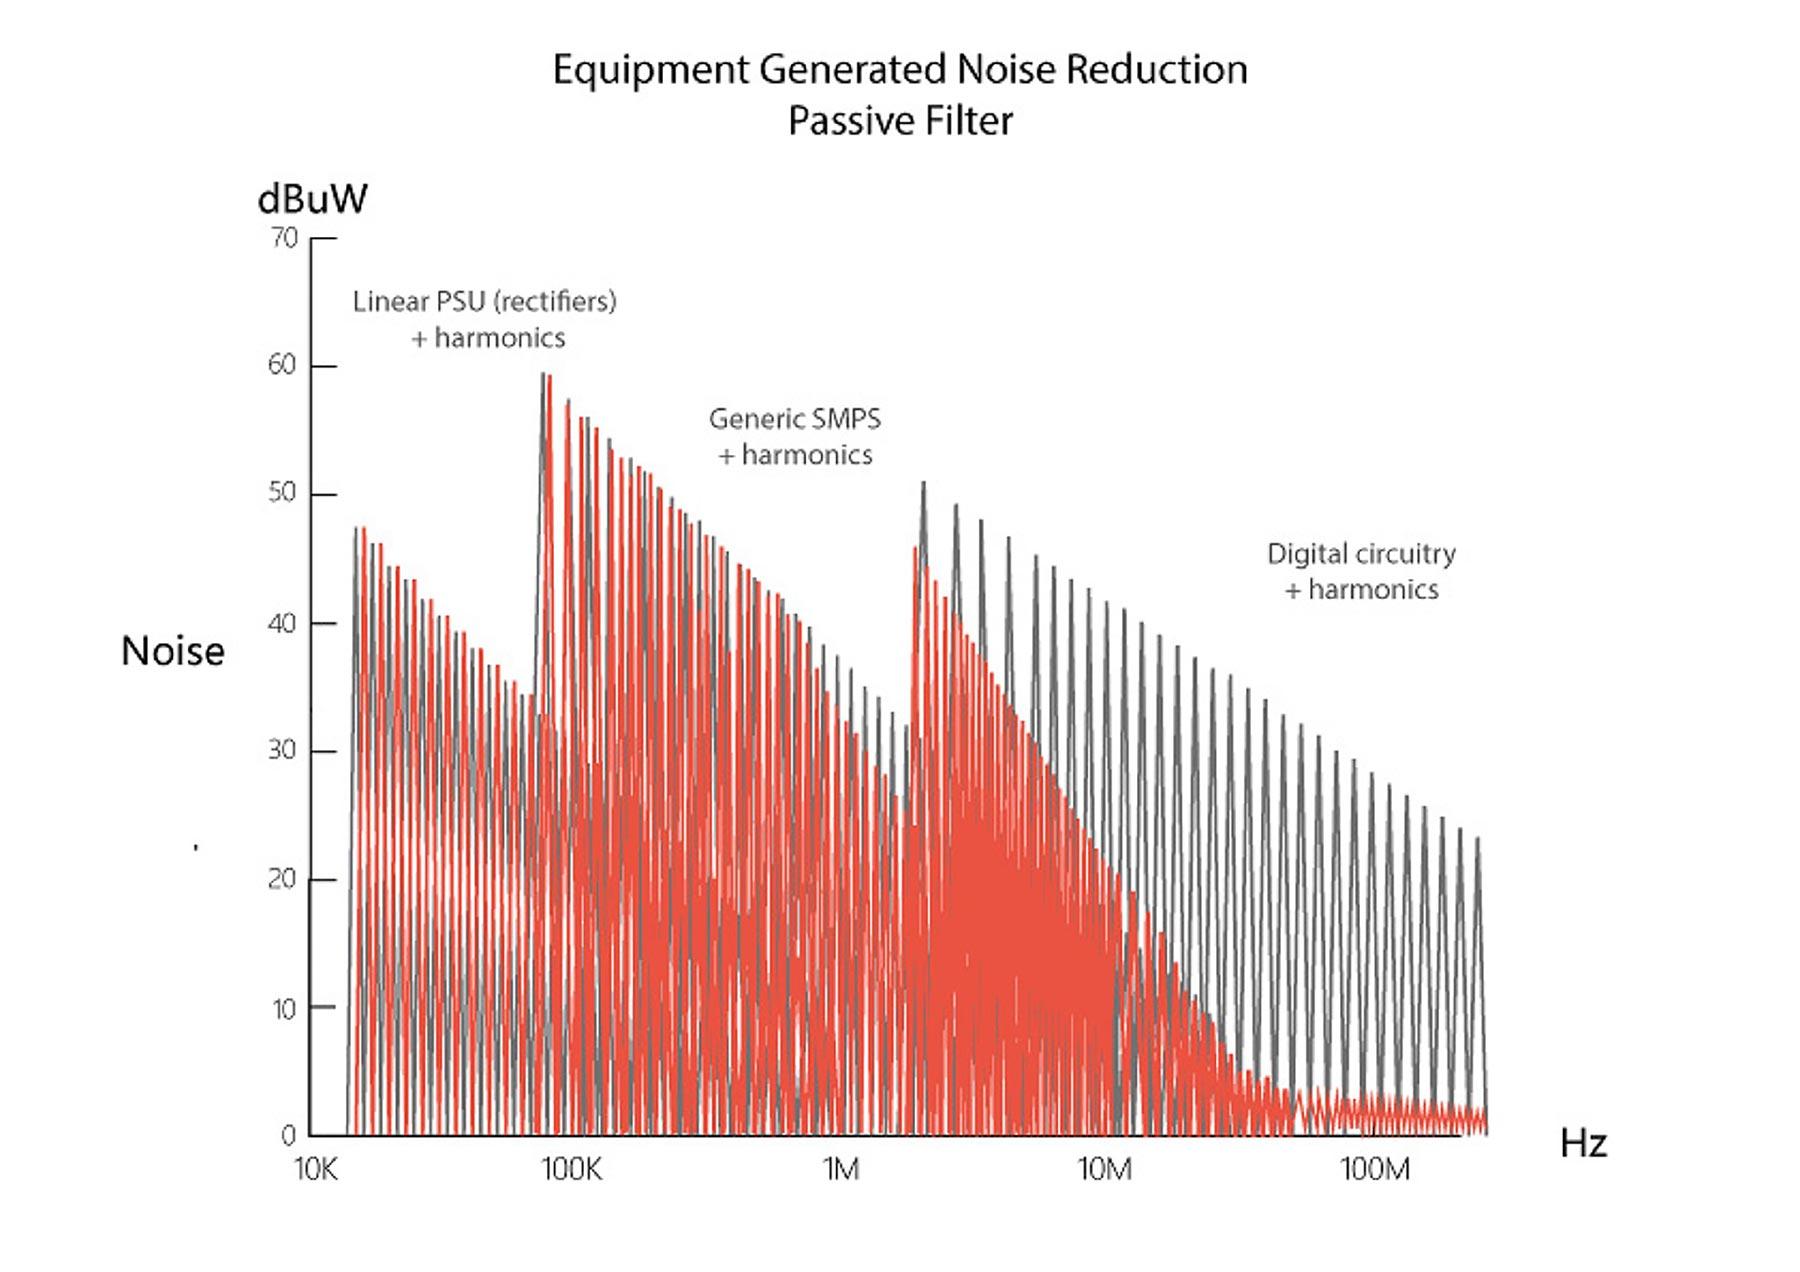 AC iPurifier Harmonic effect